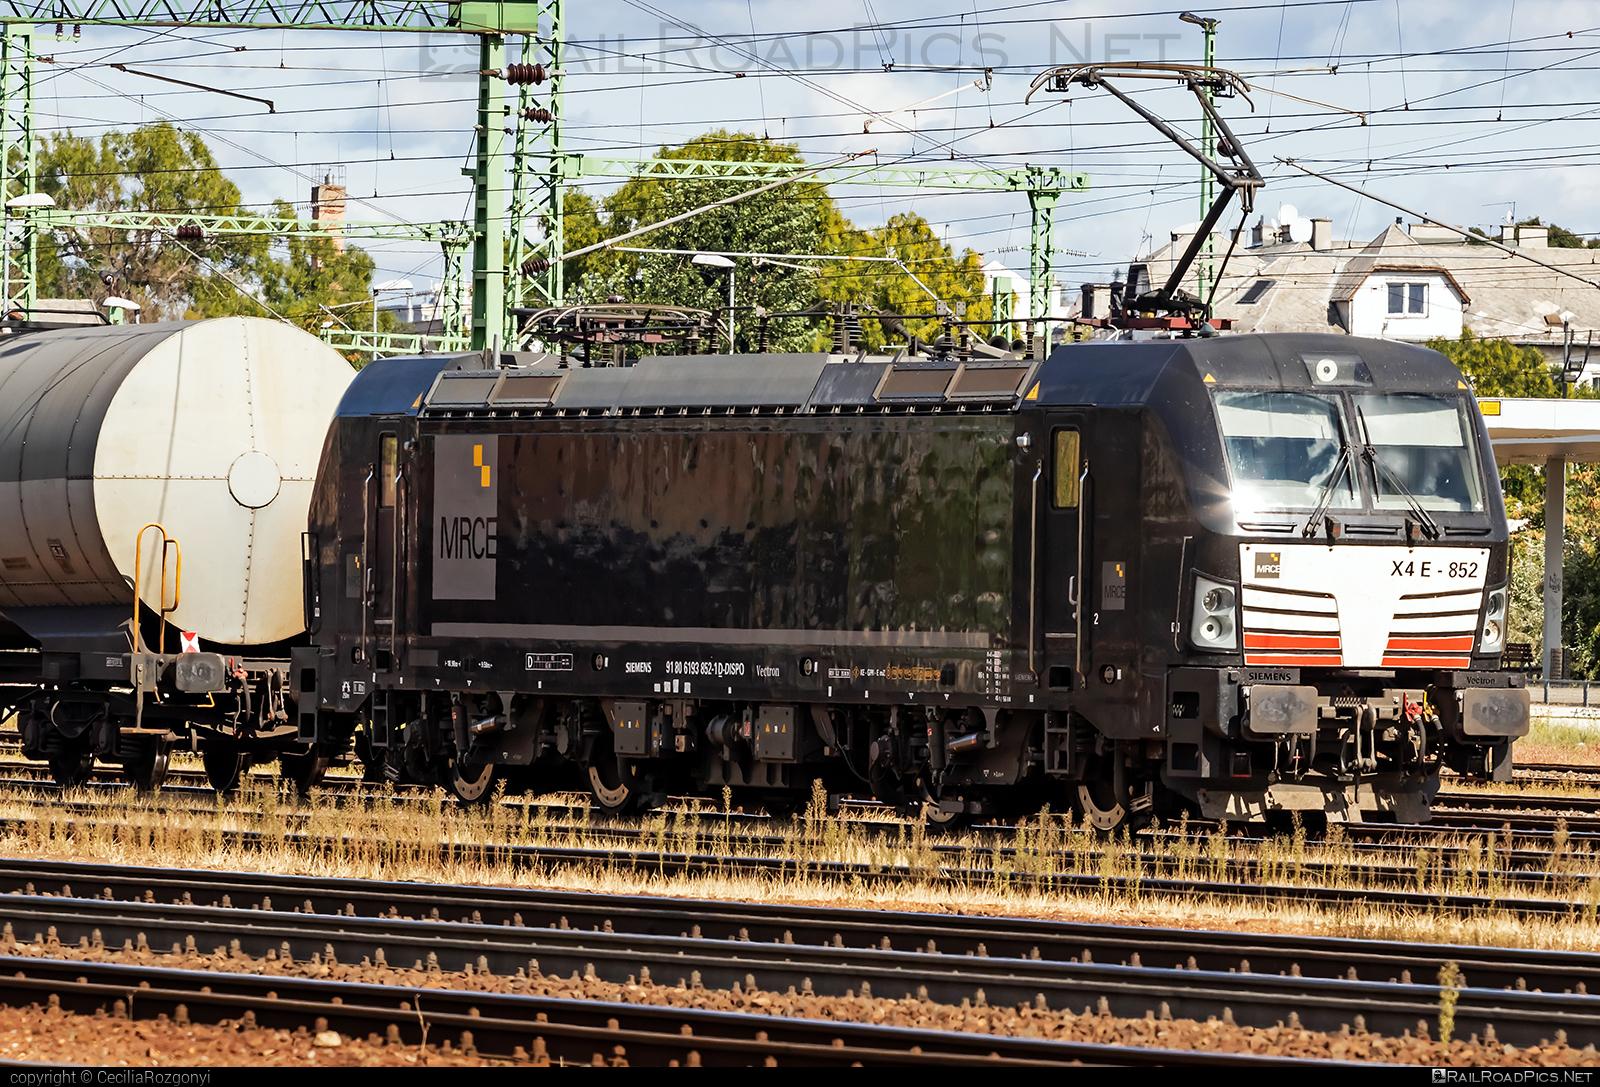 Siemens Vectron AC - 193 852 operated by Eisenbahnen und Verkehrsbetriebe Elbe-Weser #dispolok #evb #mitsuirailcapitaleurope #mitsuirailcapitaleuropegmbh #mrce #siemens #siemensvectron #siemensvectronac #vectron #vectronac